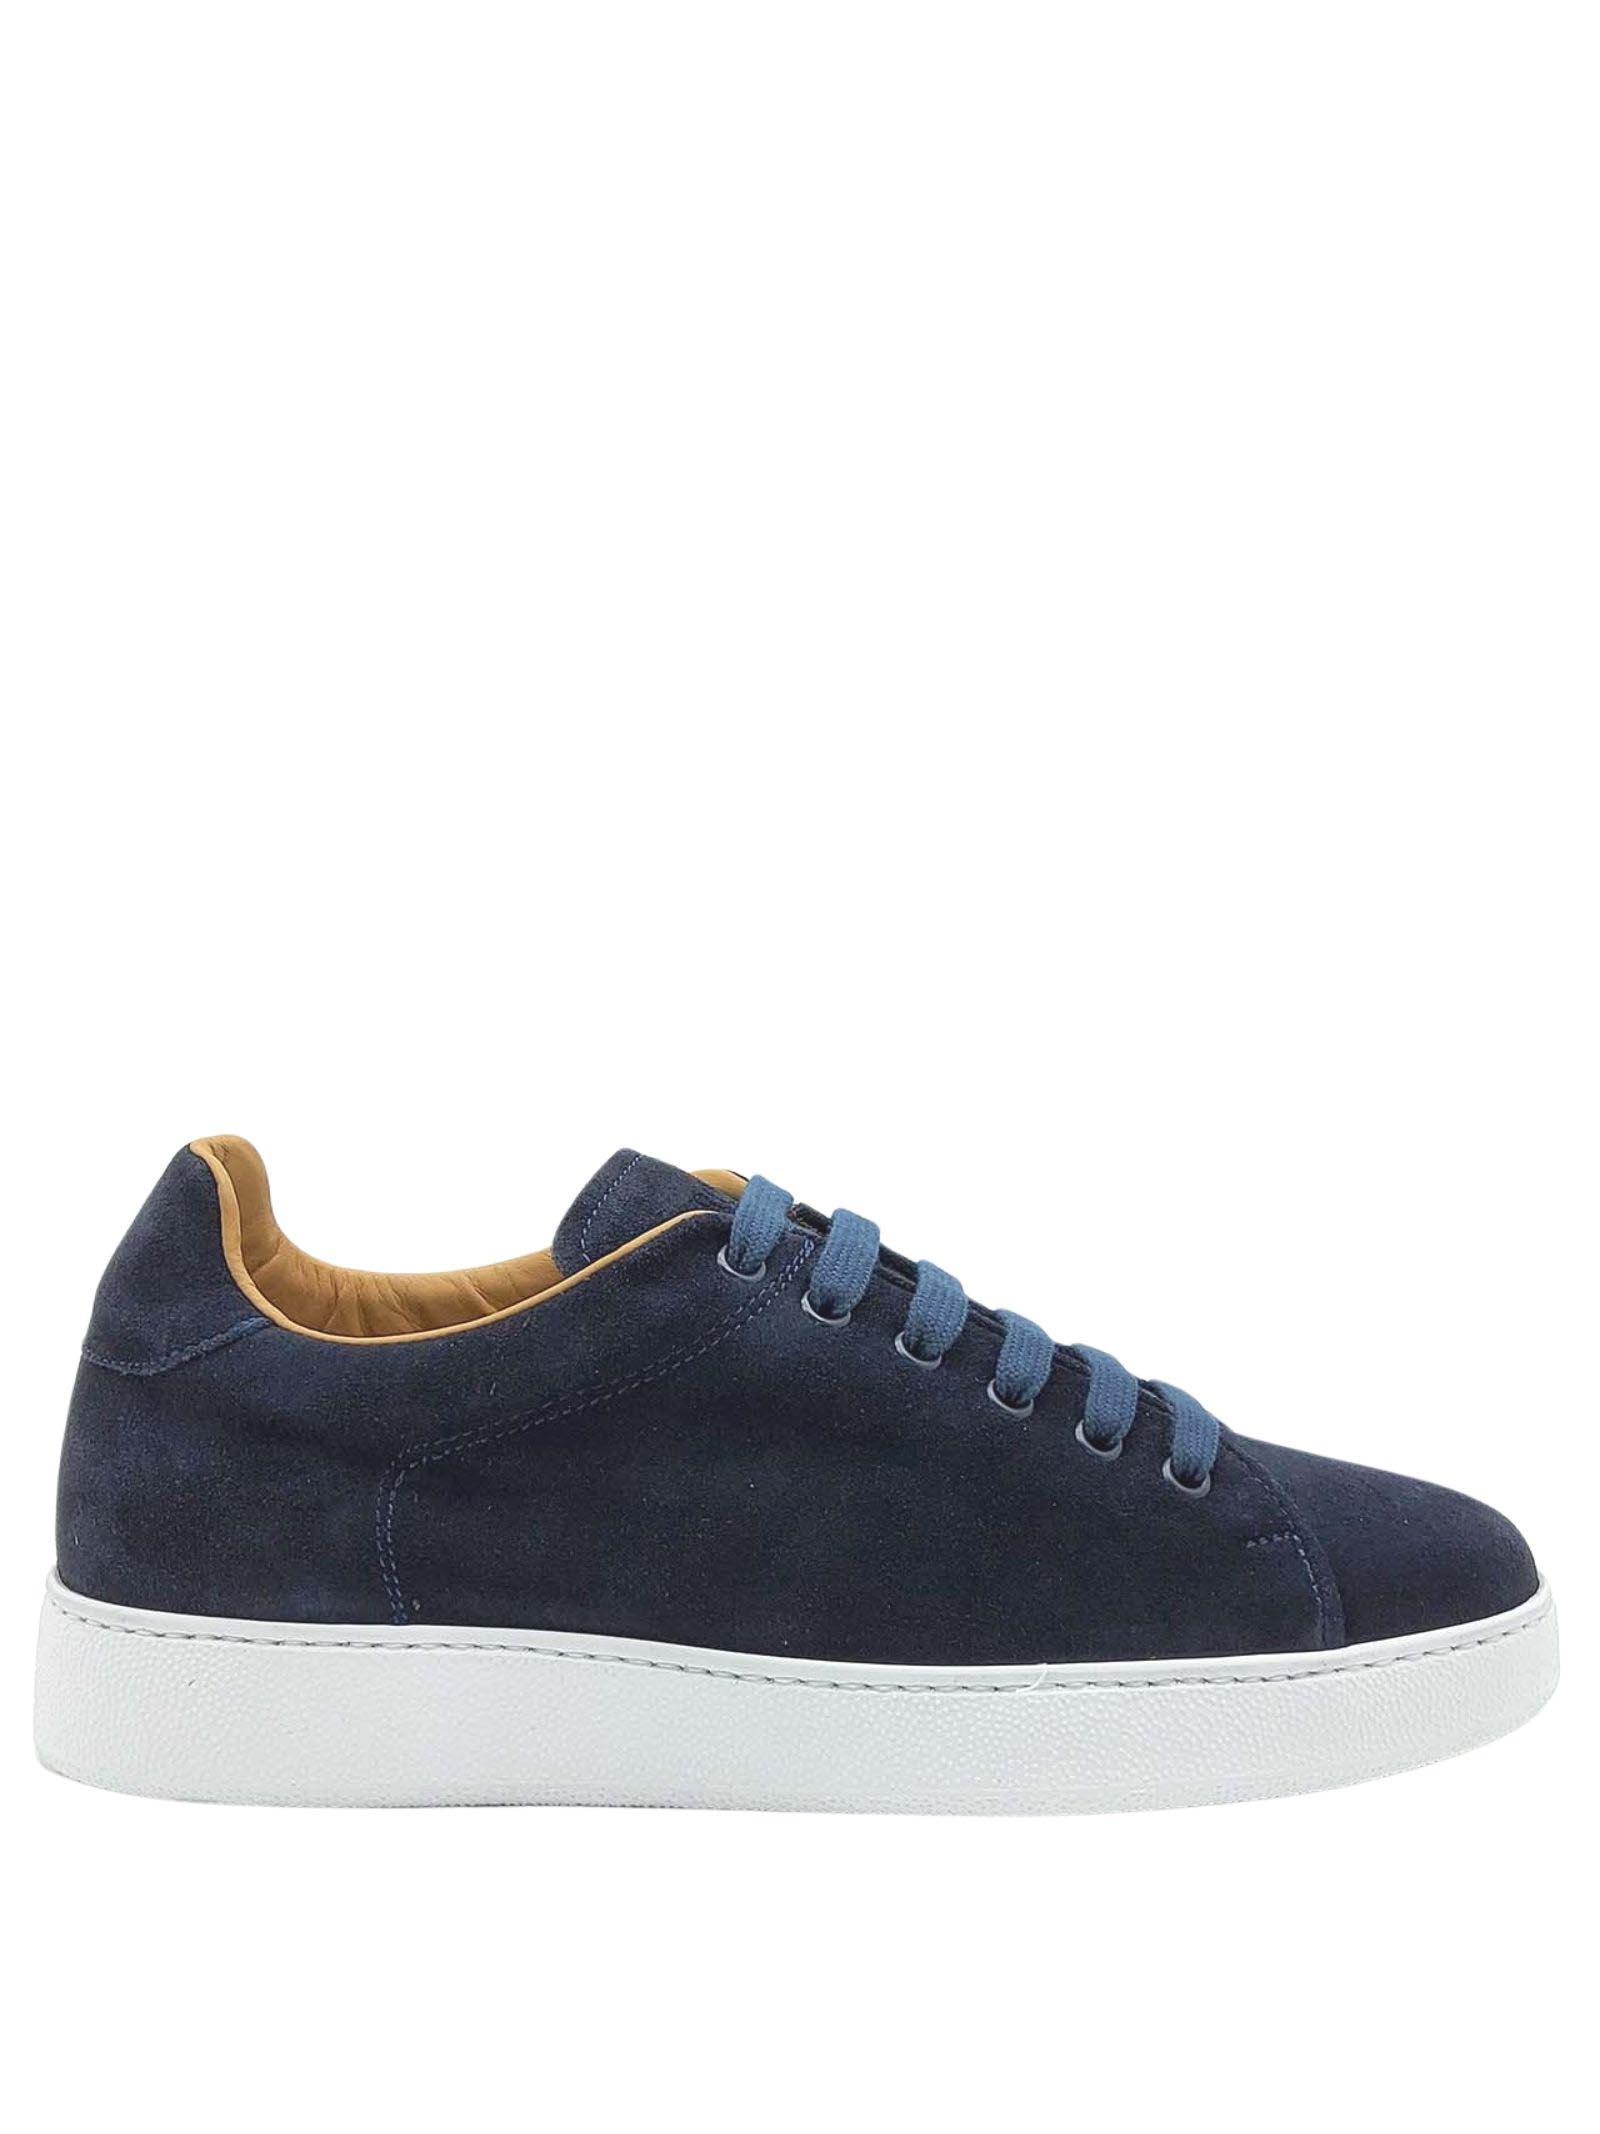 Calzature Uomo Sneakers Stringate in Camoscio Blu Fodera in Pelle e Fondo Gomma Bianco Rogal's | Sneakers | MUR1002